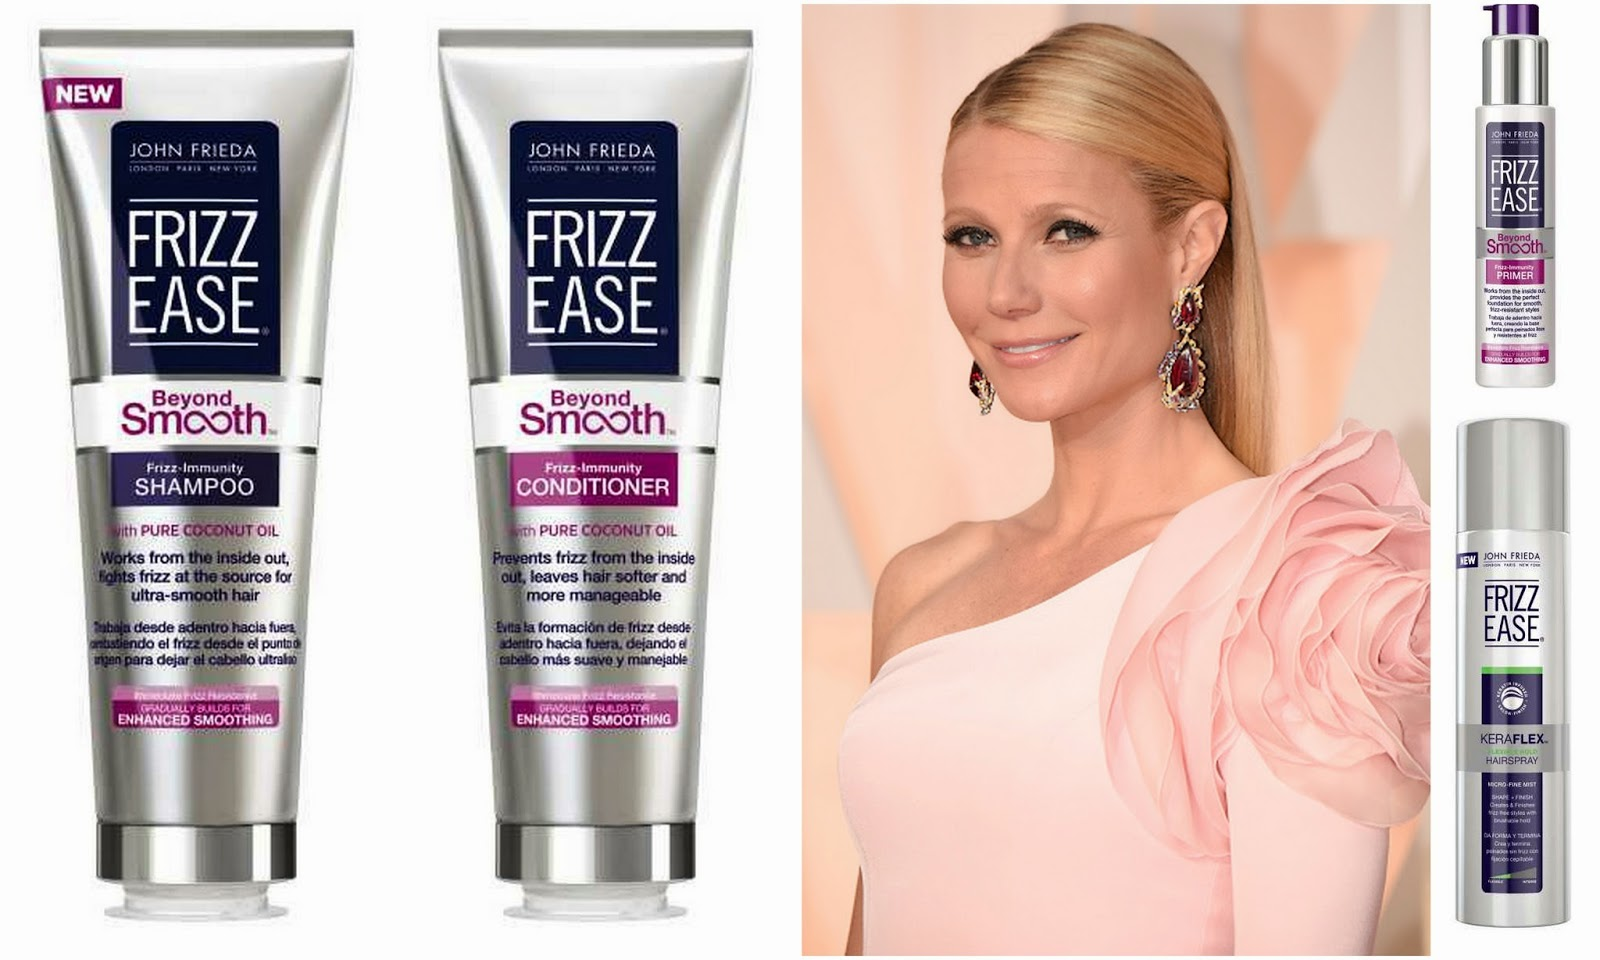 Gwyneth Paltrow: Get the Look with John Frieda Hair Care